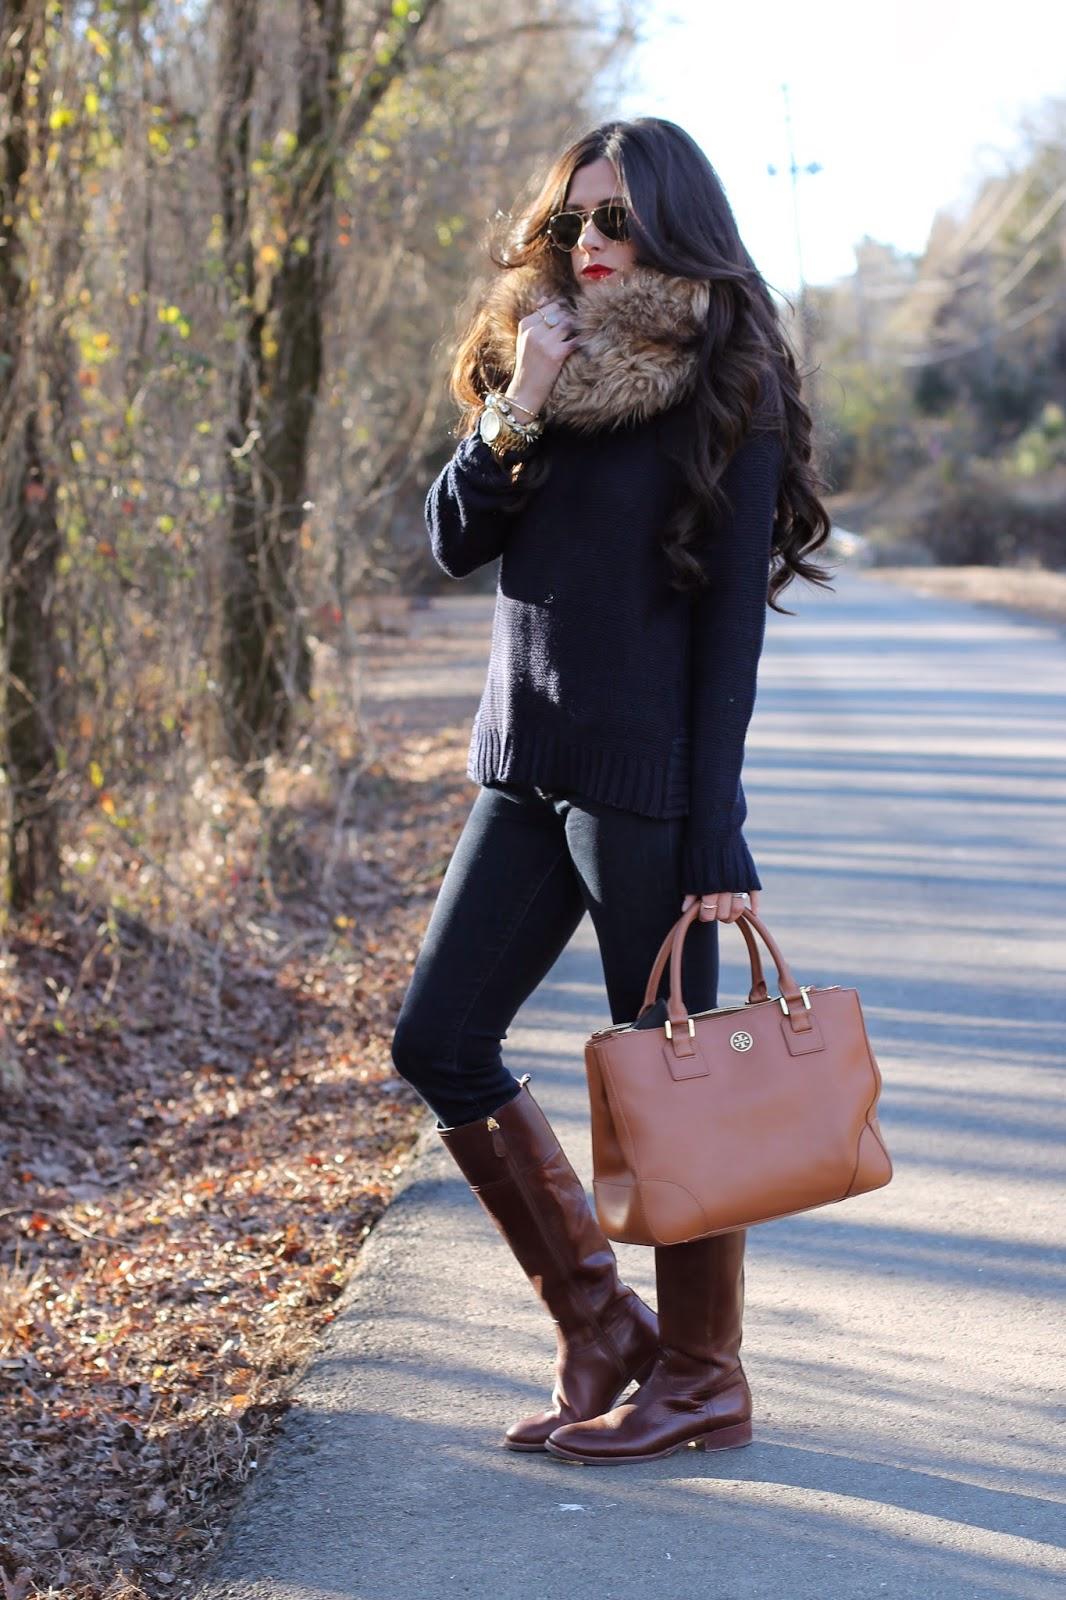 hair extensions, bellami hair, michael kors watch gold, fur snood, tory burch, tory burch boots, tory burch purse, kiernan riding boot, rayban aviators, fashion blog, style blog, winter 2014 trends